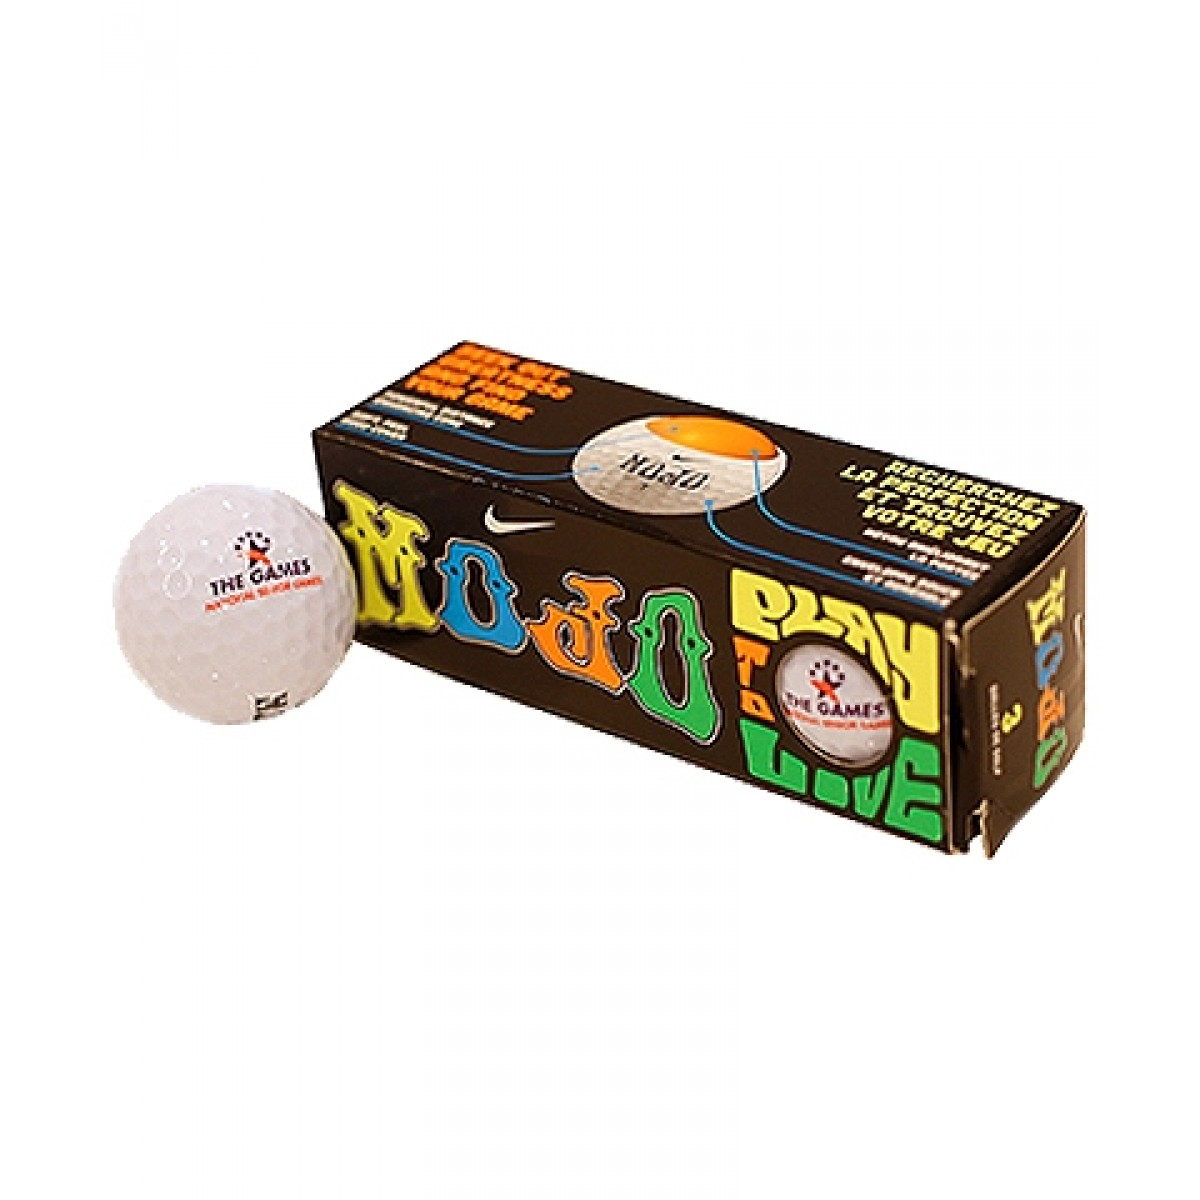 Set of 3 Senior Games Golf Balls